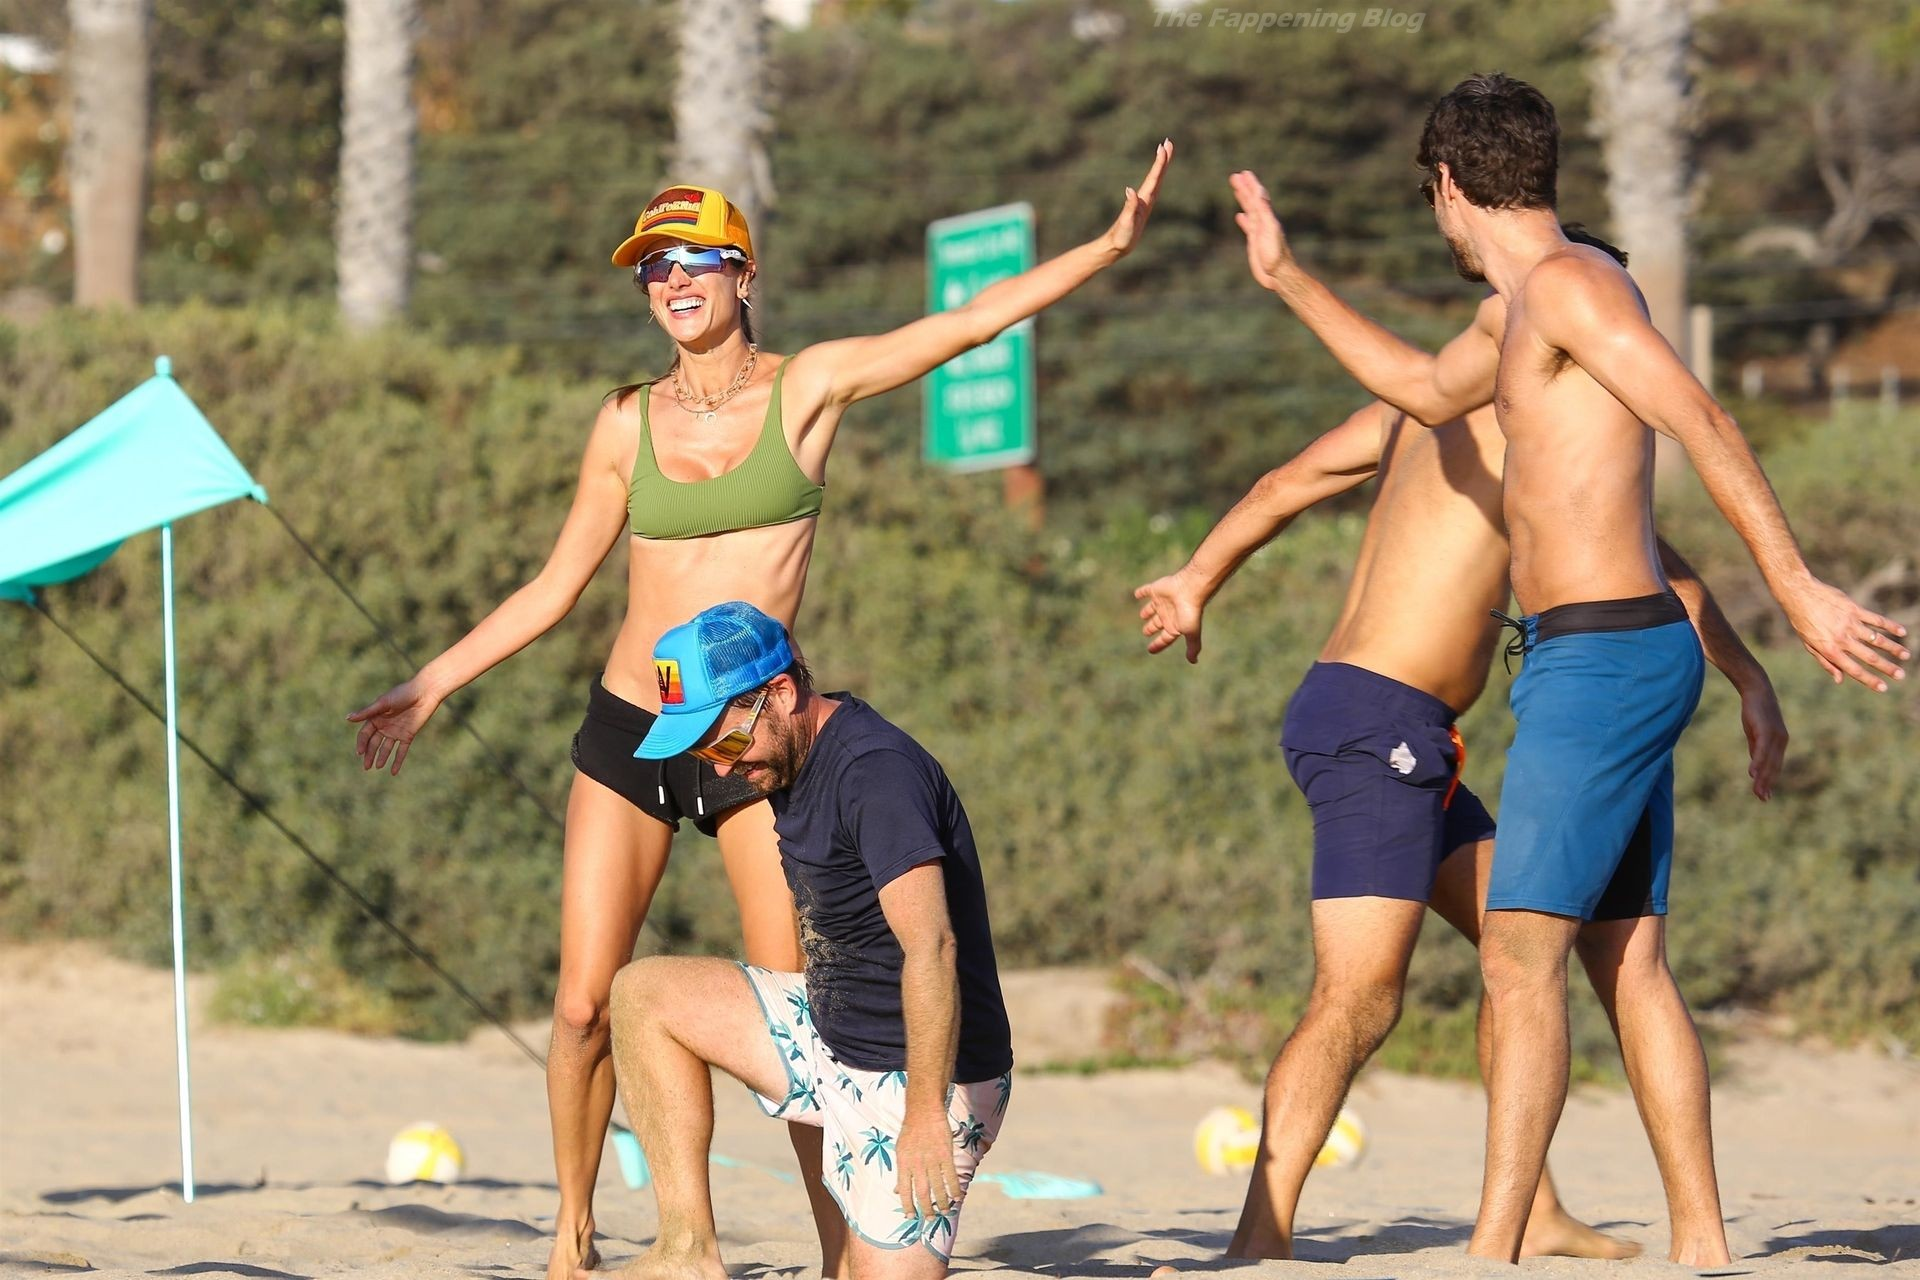 Alessandra Ambrosio Sexy on Beach 107